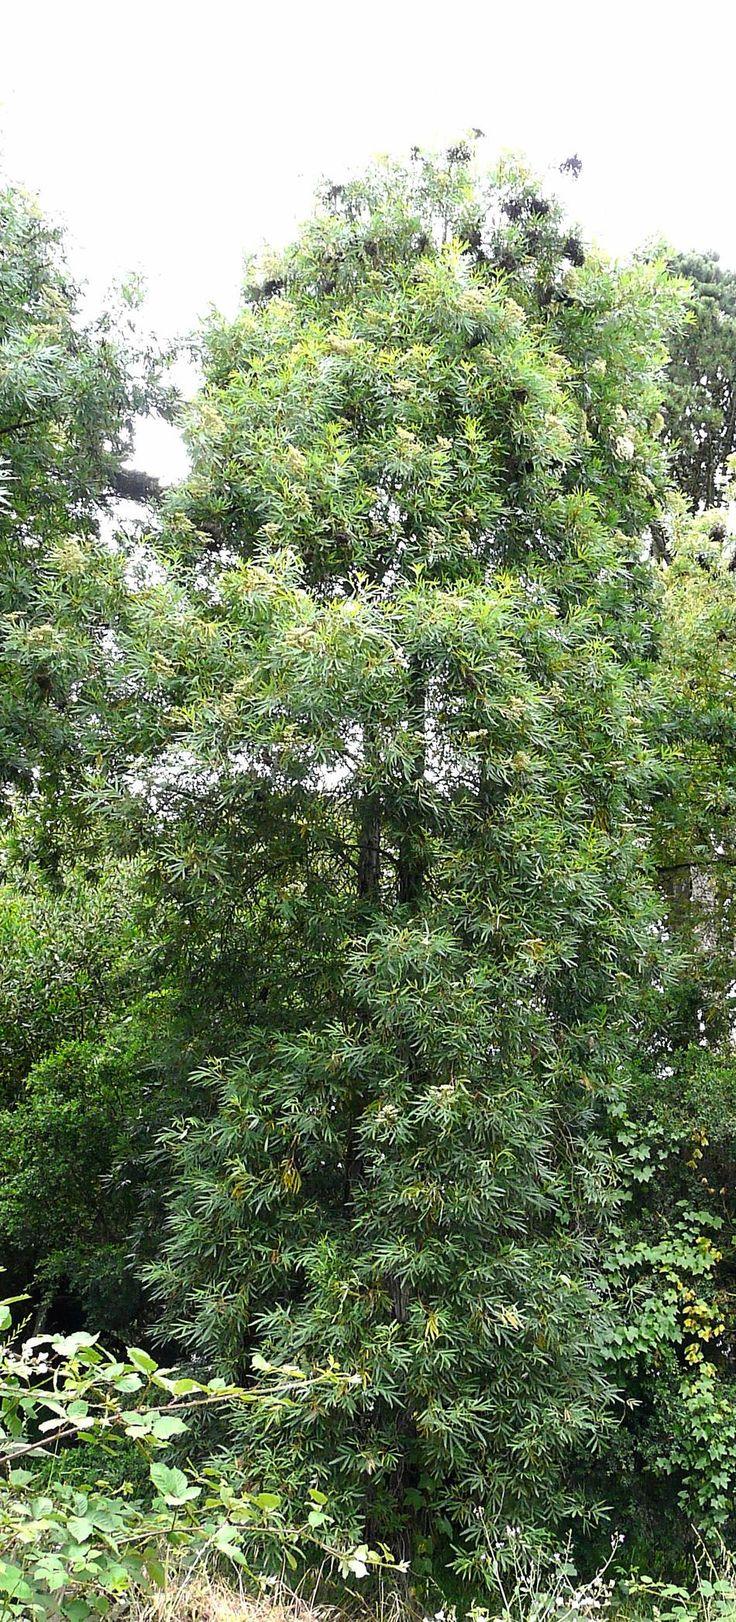 Catalina Ironwood leaves, Lyonothamnus floribundus